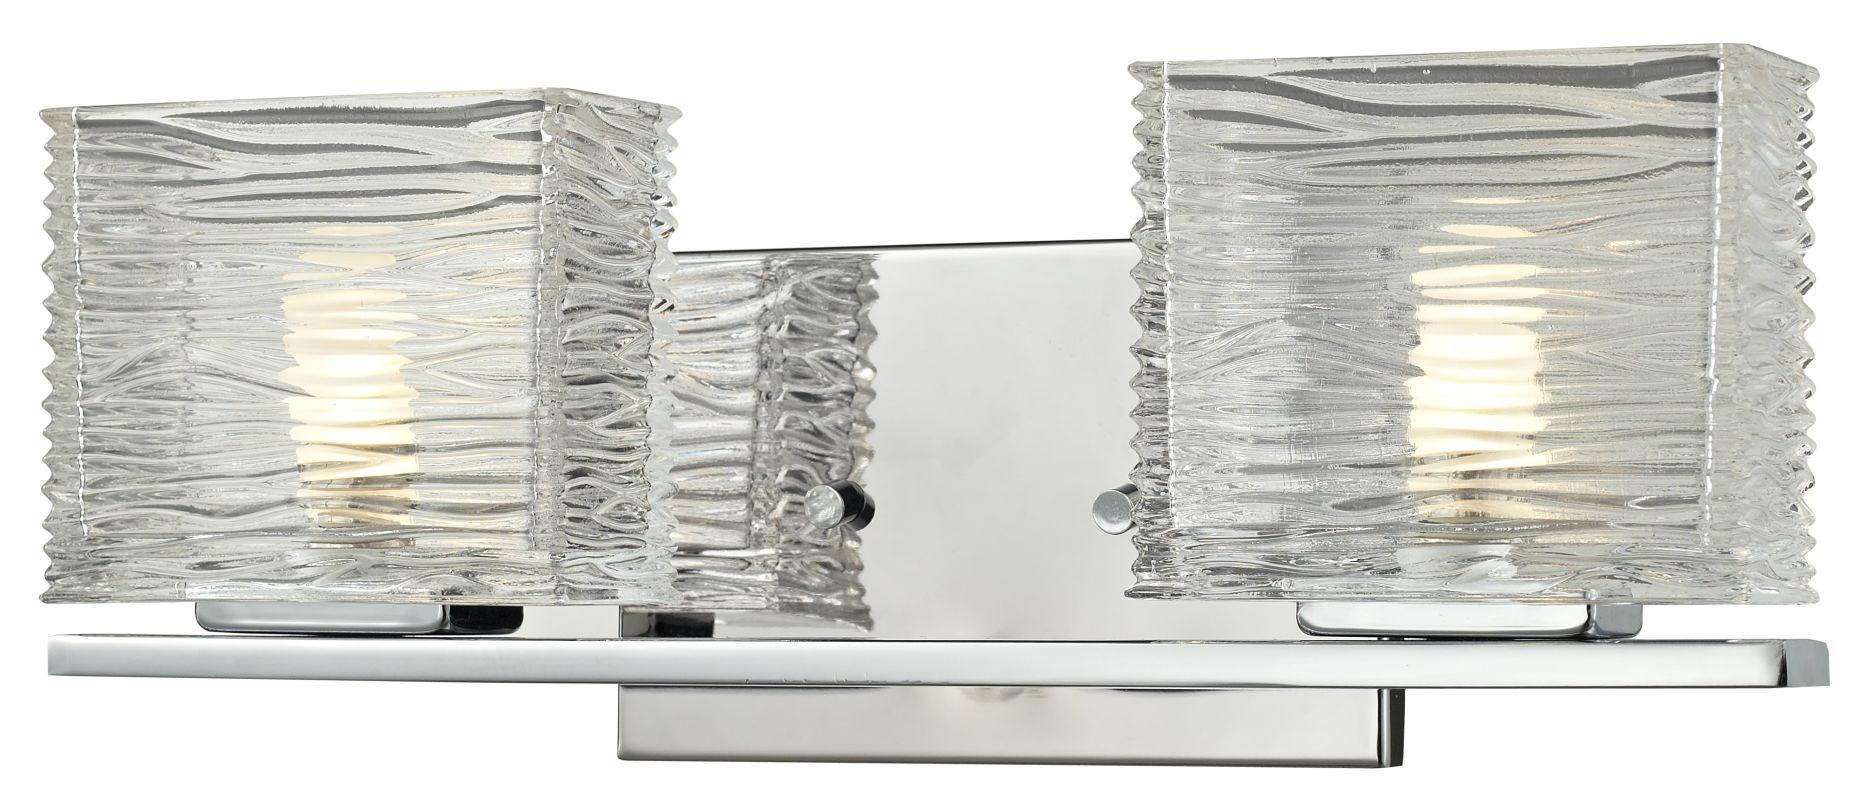 Z-Lite 3025-2V Jaol 2 Light ADA Compliant Bathroom Vanity Light with